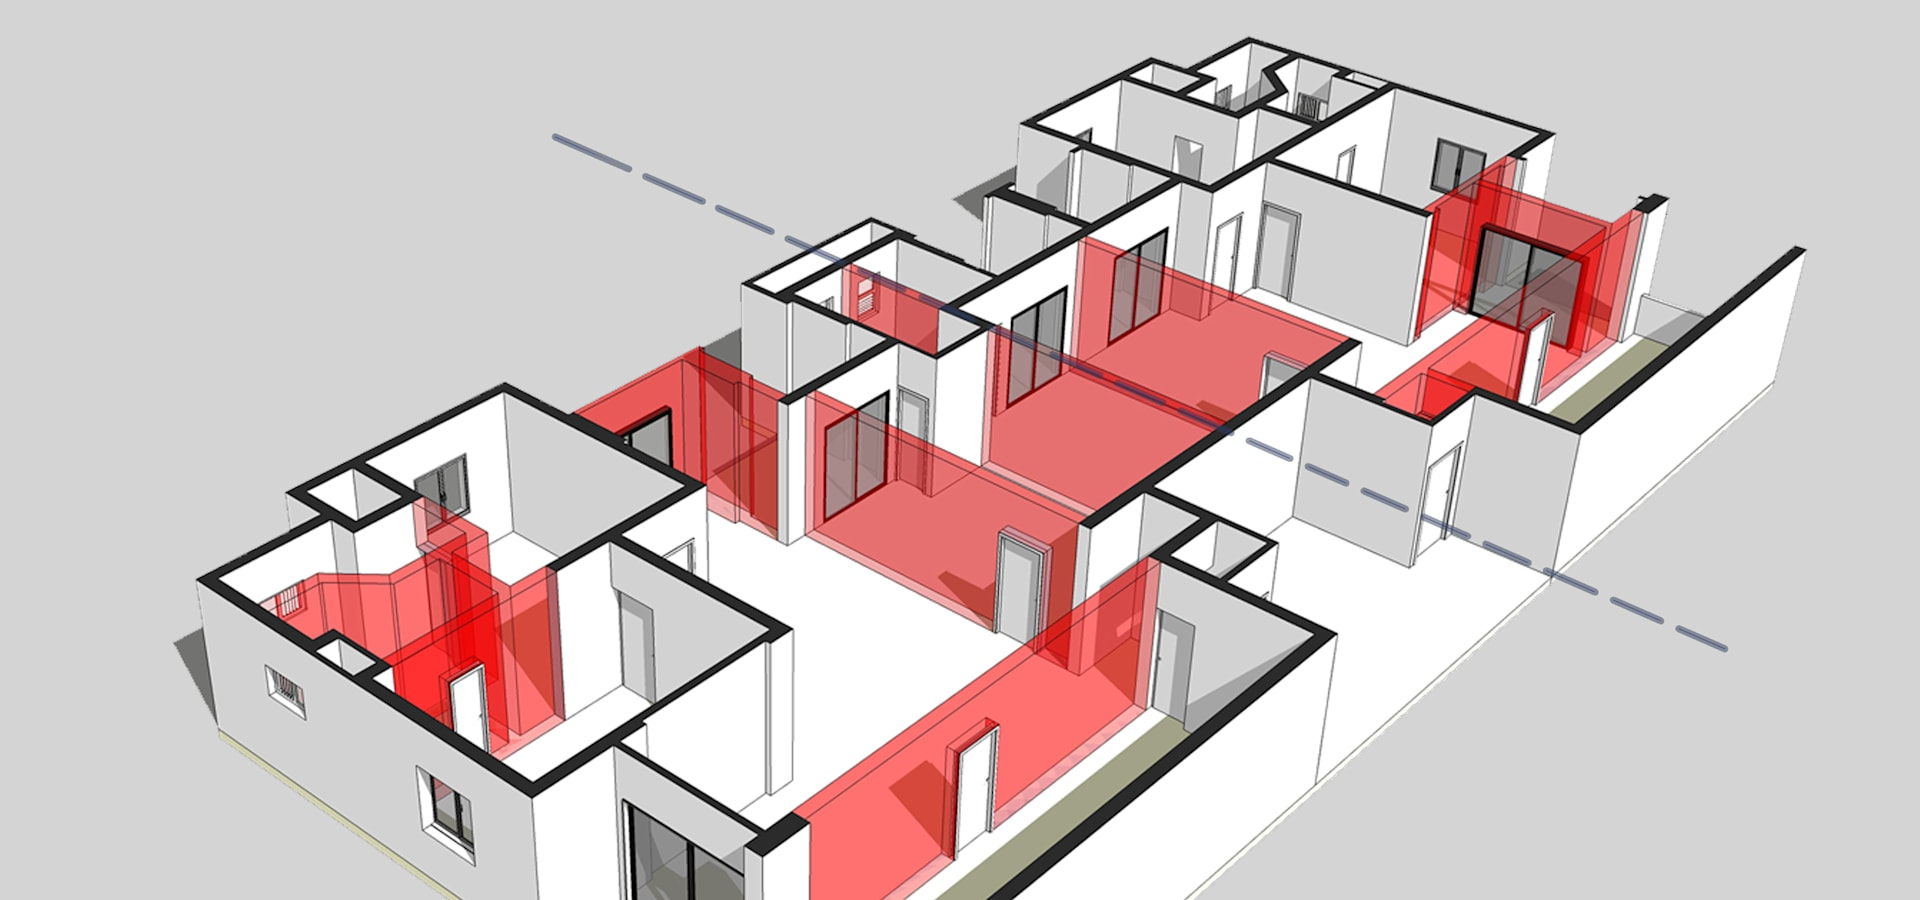 PSR Architecture